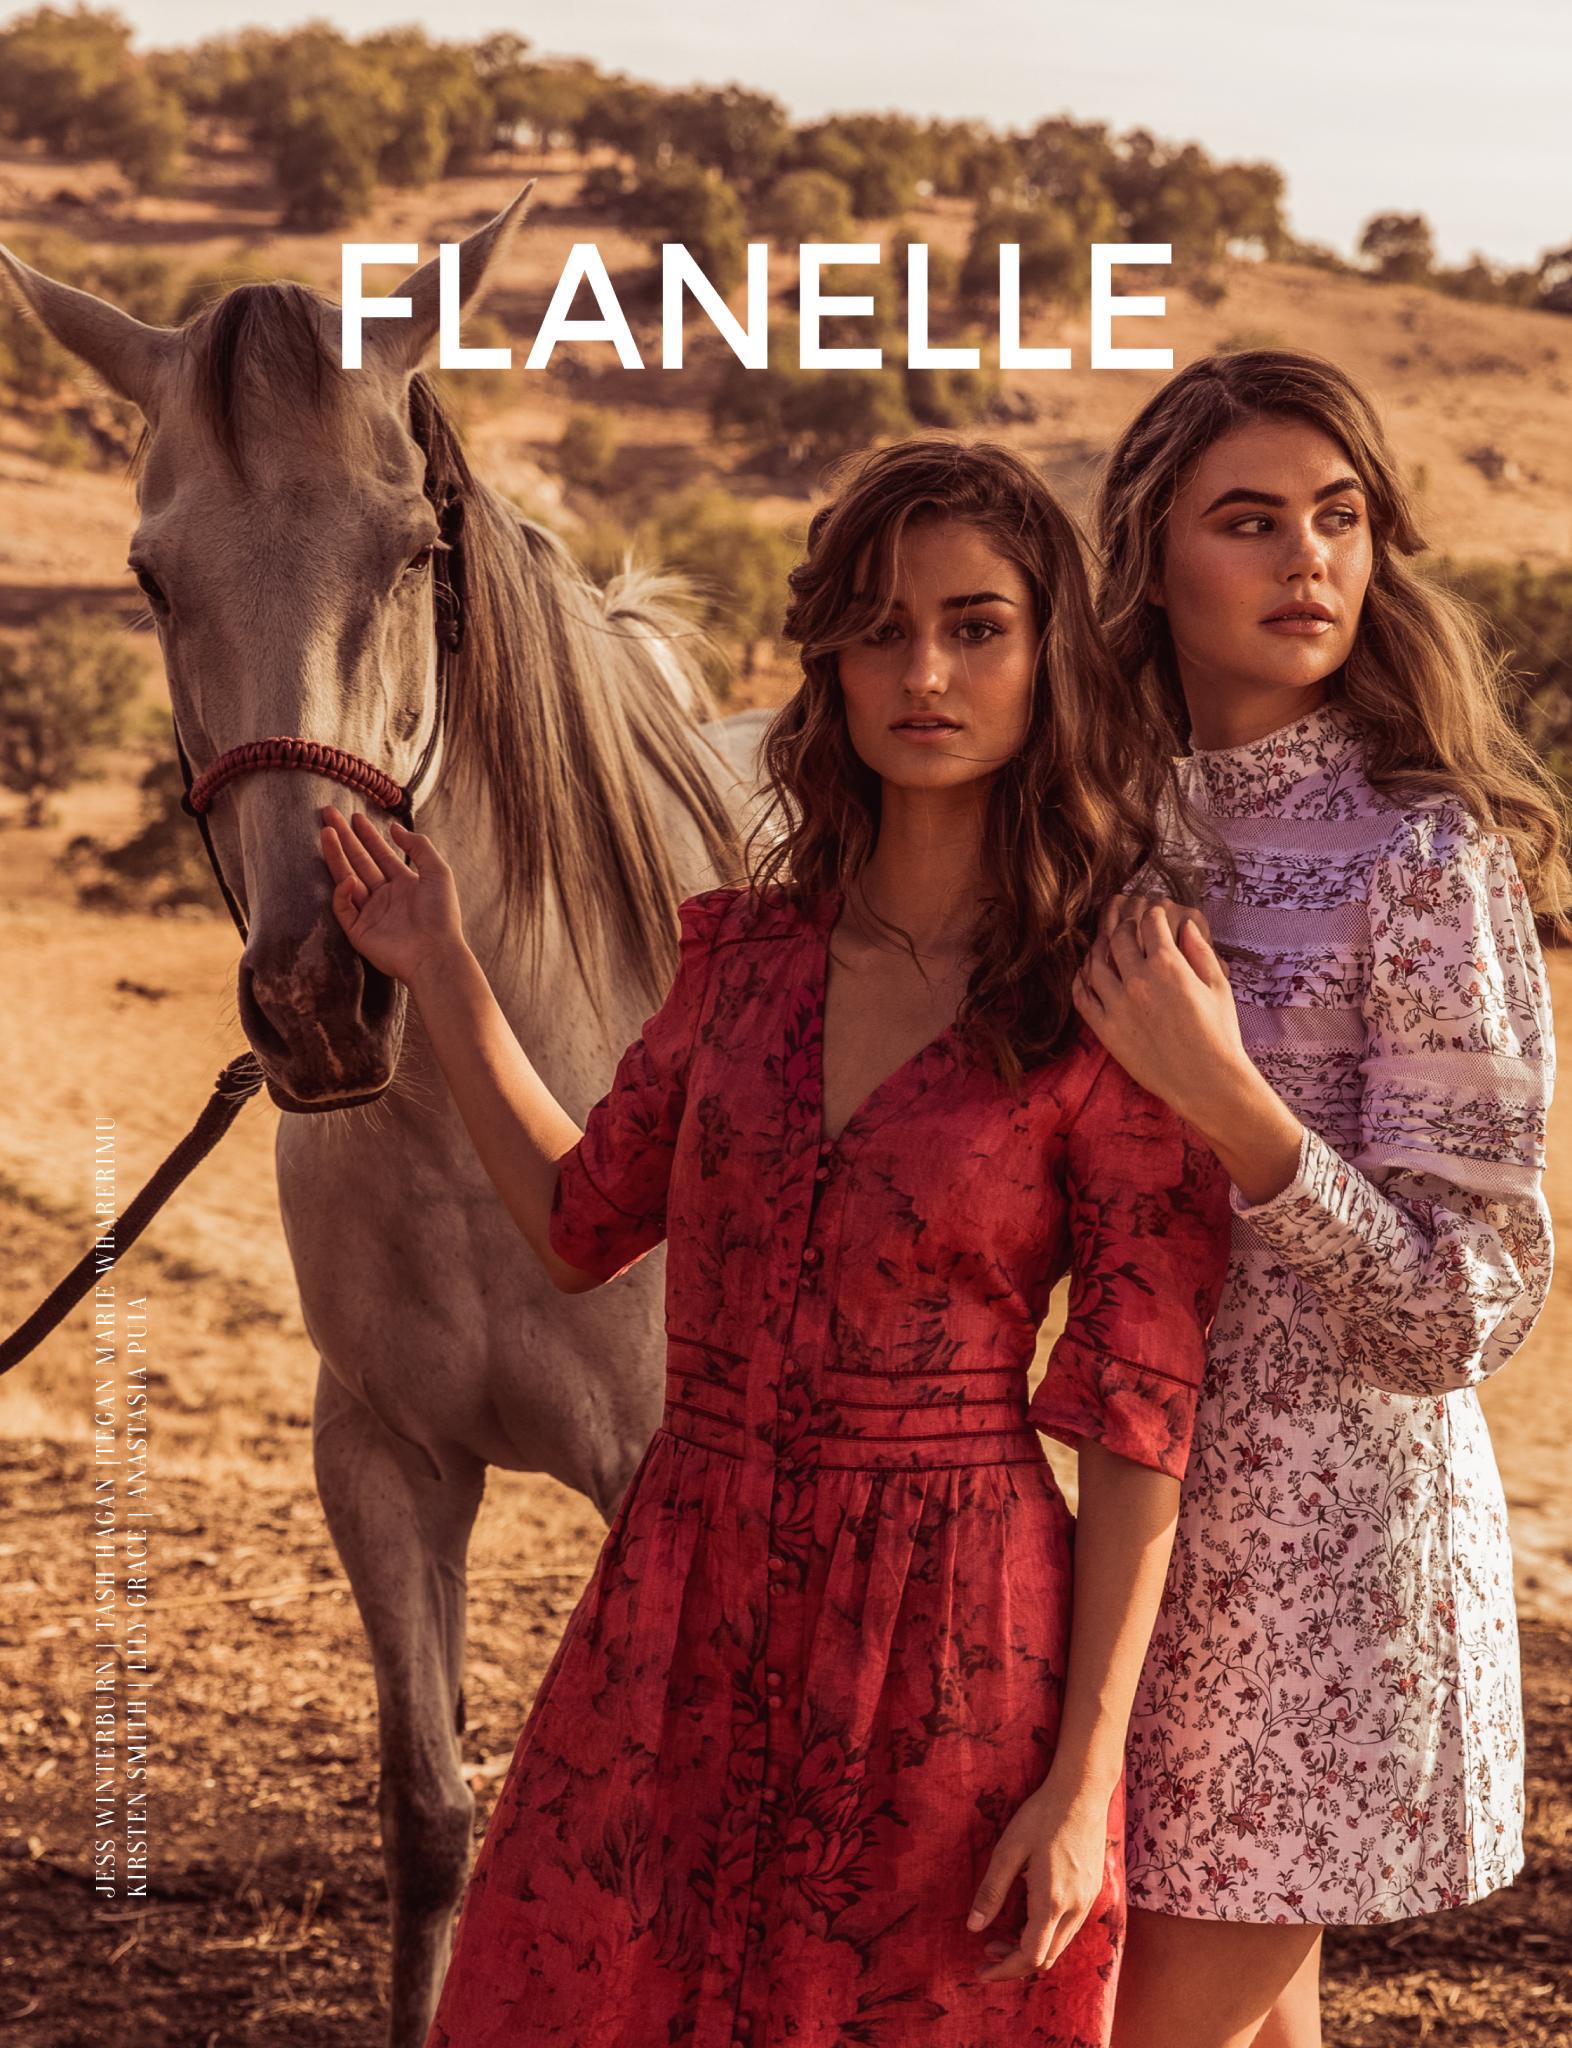 flanelle_easyrider1.jpg